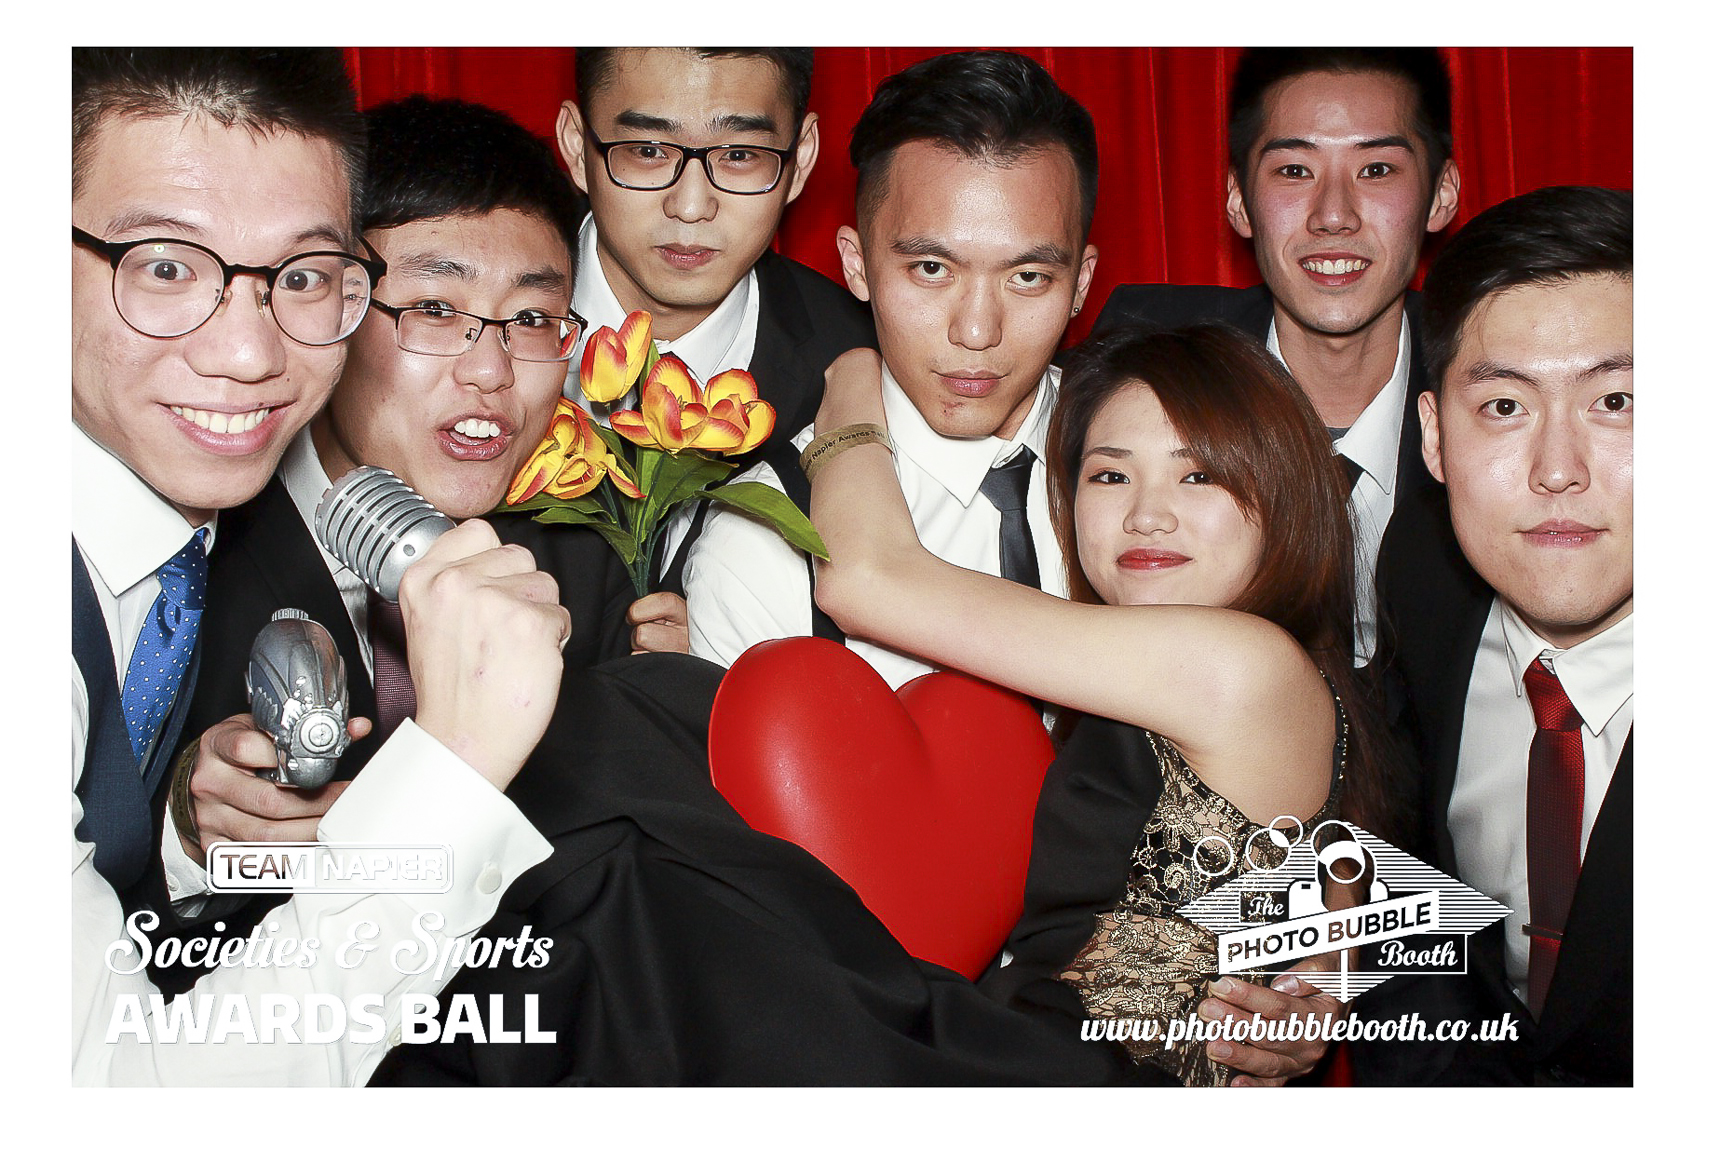 Napier Societies & Sports Awards_46.JPG